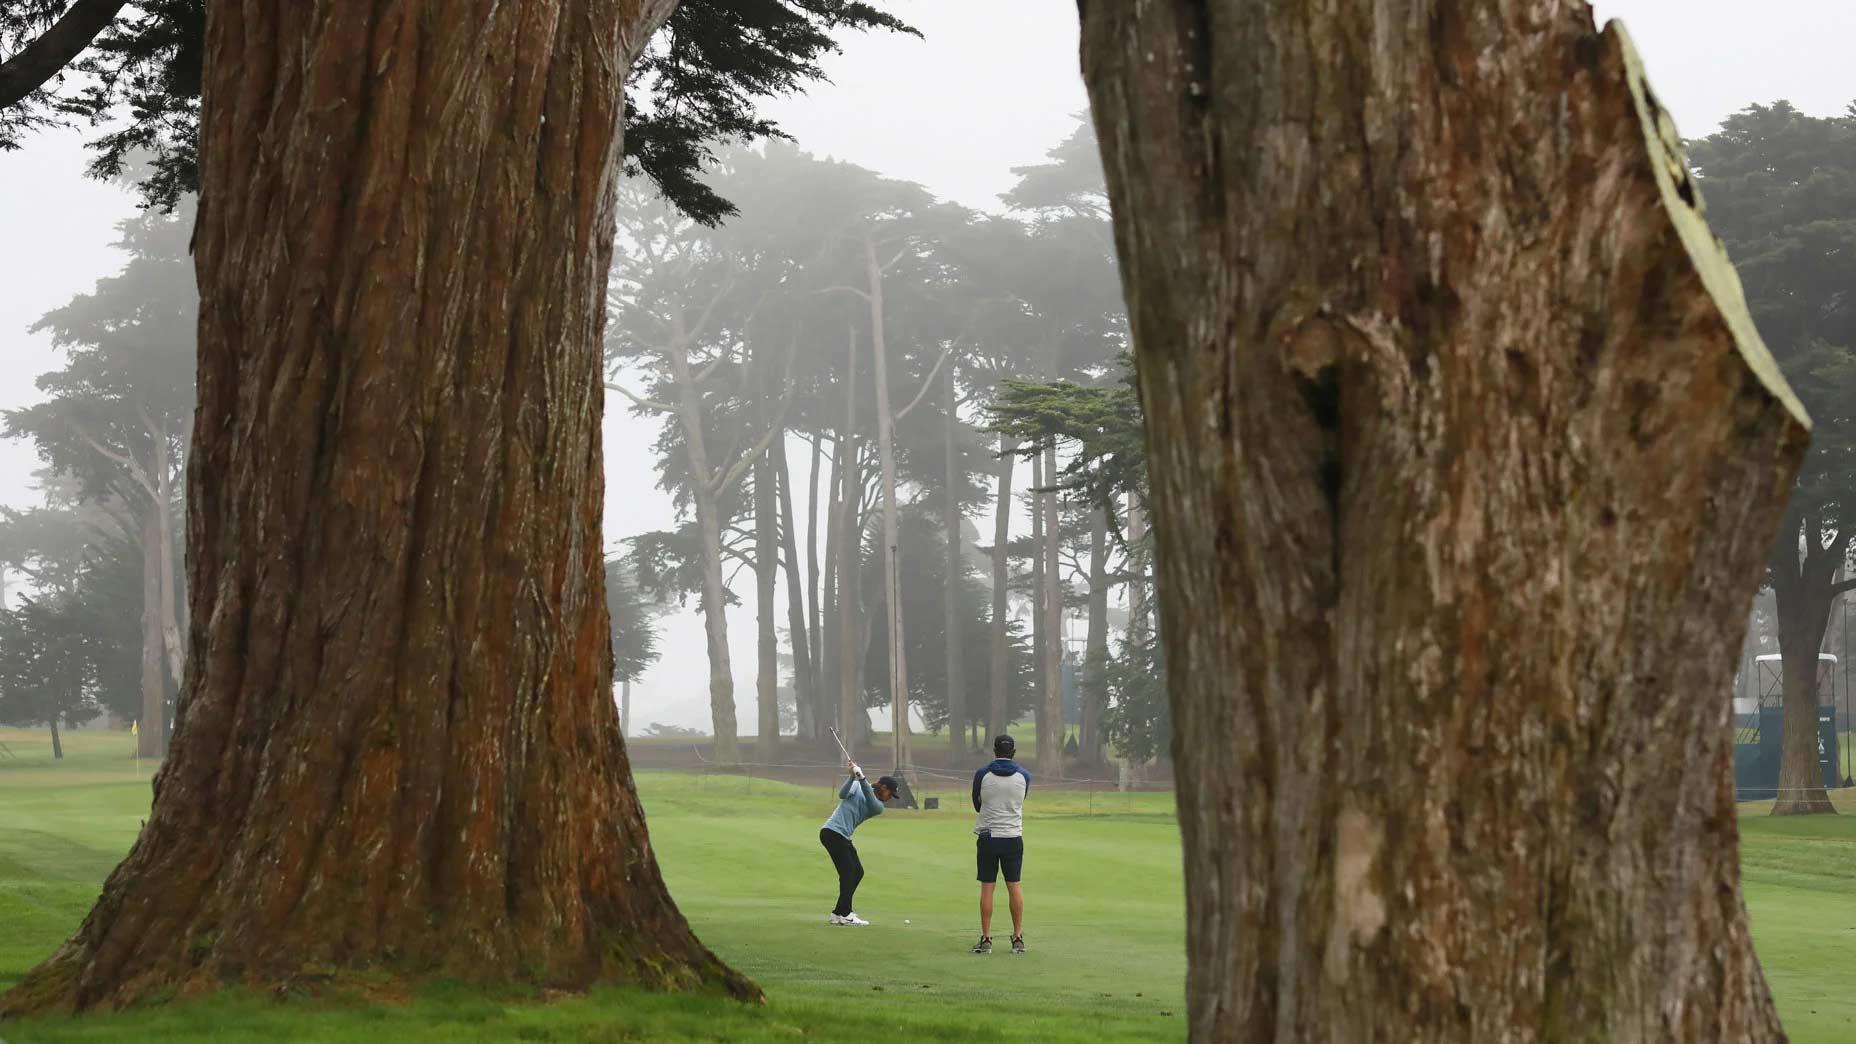 Pro golfer Tommy Fleetwood plays TPC Harding Park